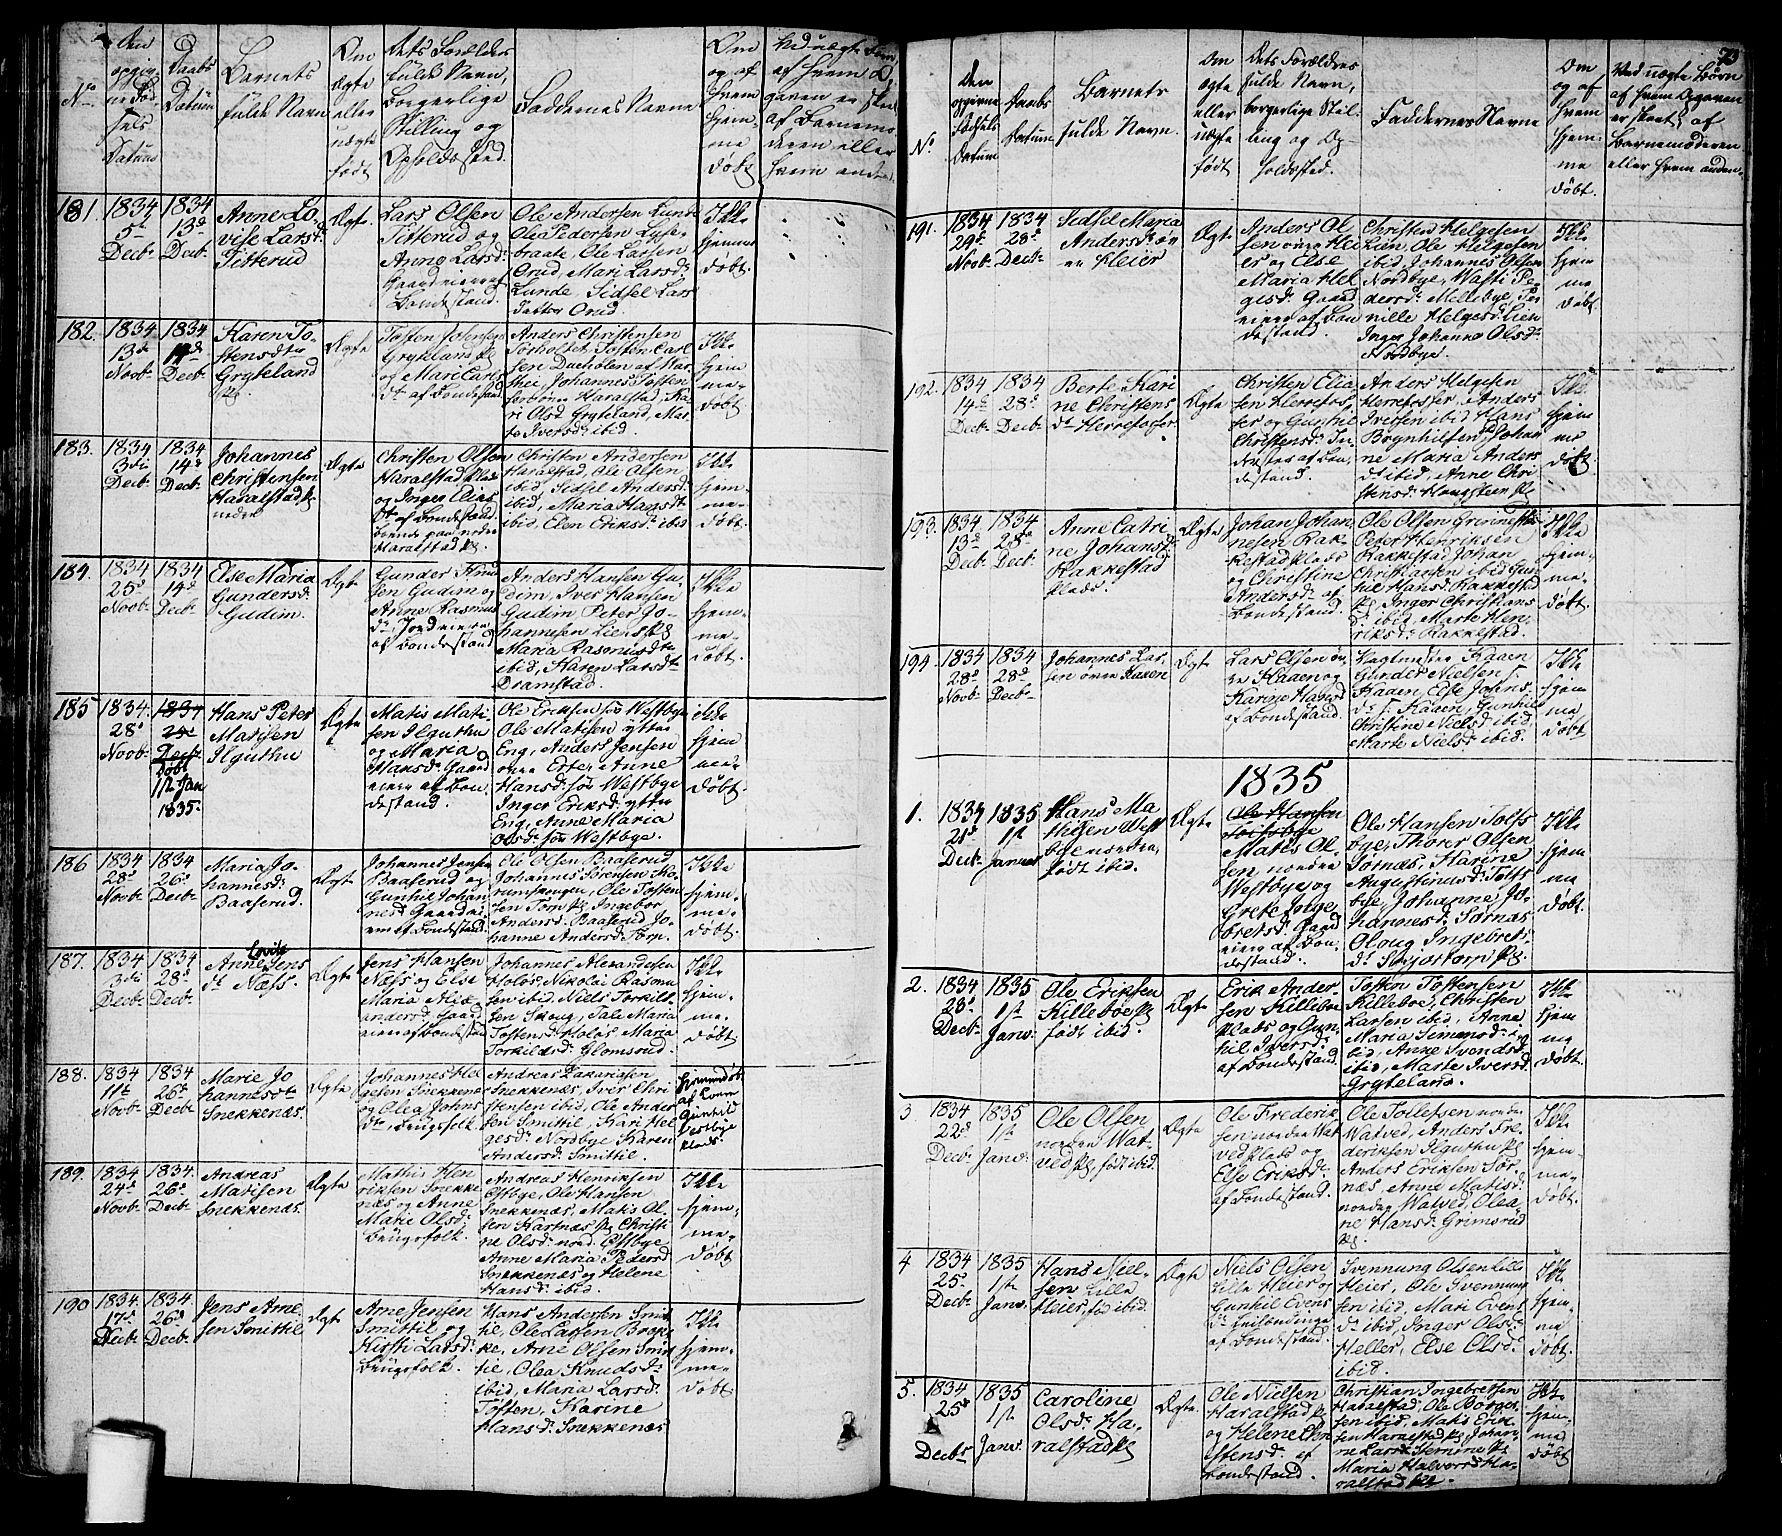 SAO, Rakkestad prestekontor Kirkebøker, F/Fa/L0007: Ministerialbok nr. I 7, 1825-1841, s. 73